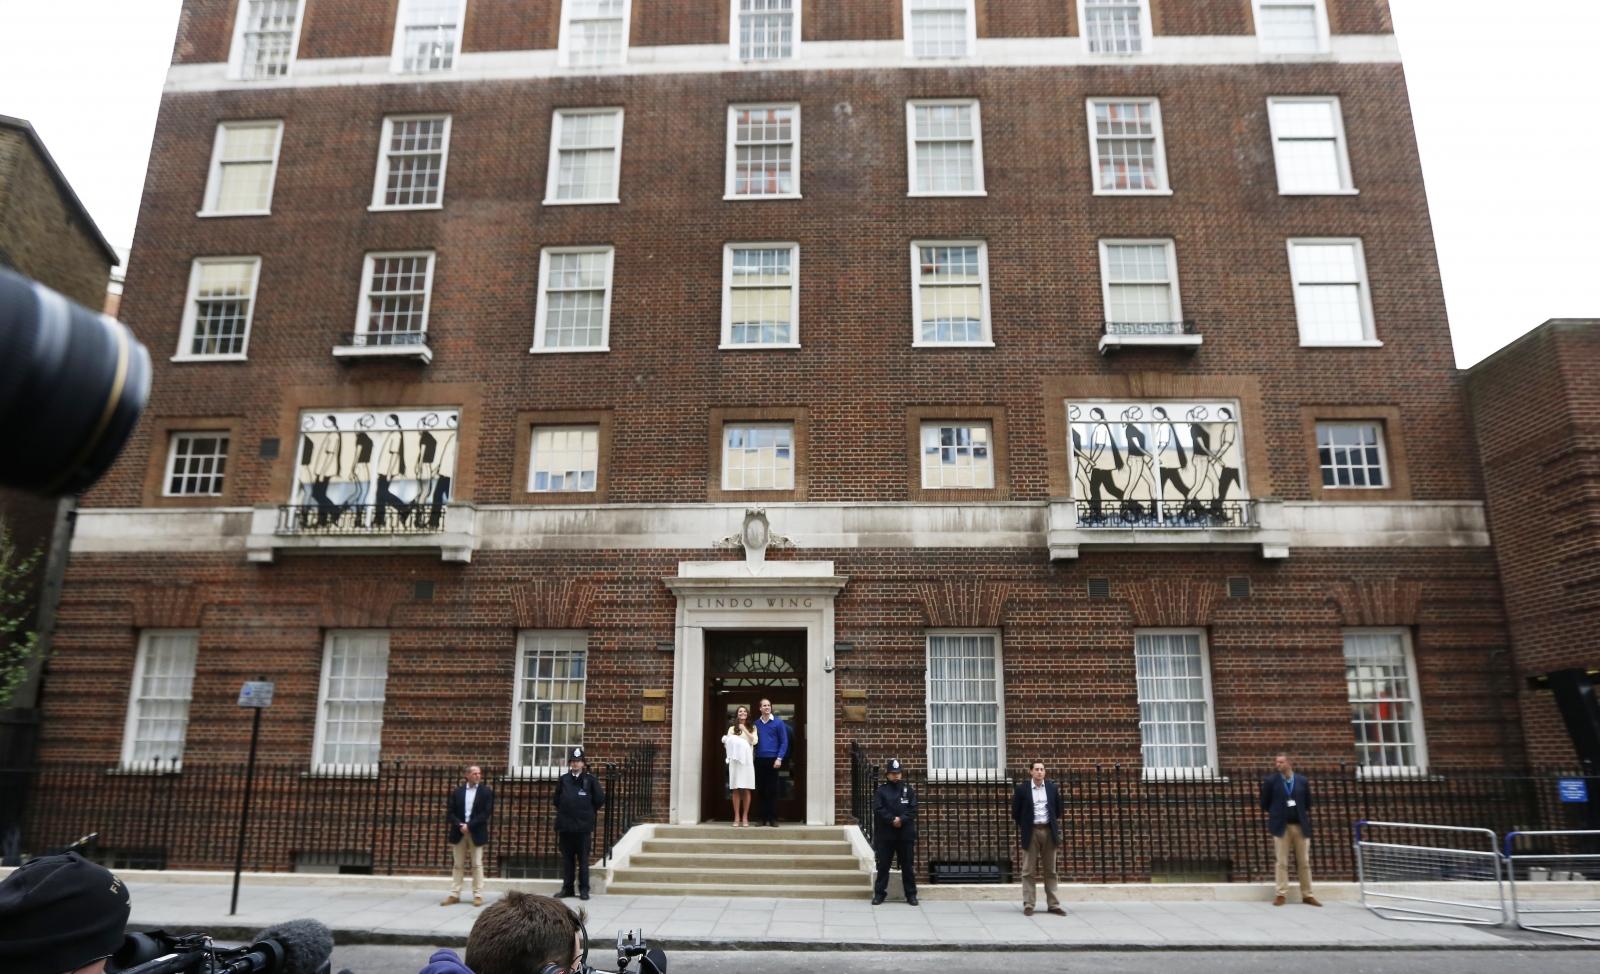 St. Mary's hospital, west London